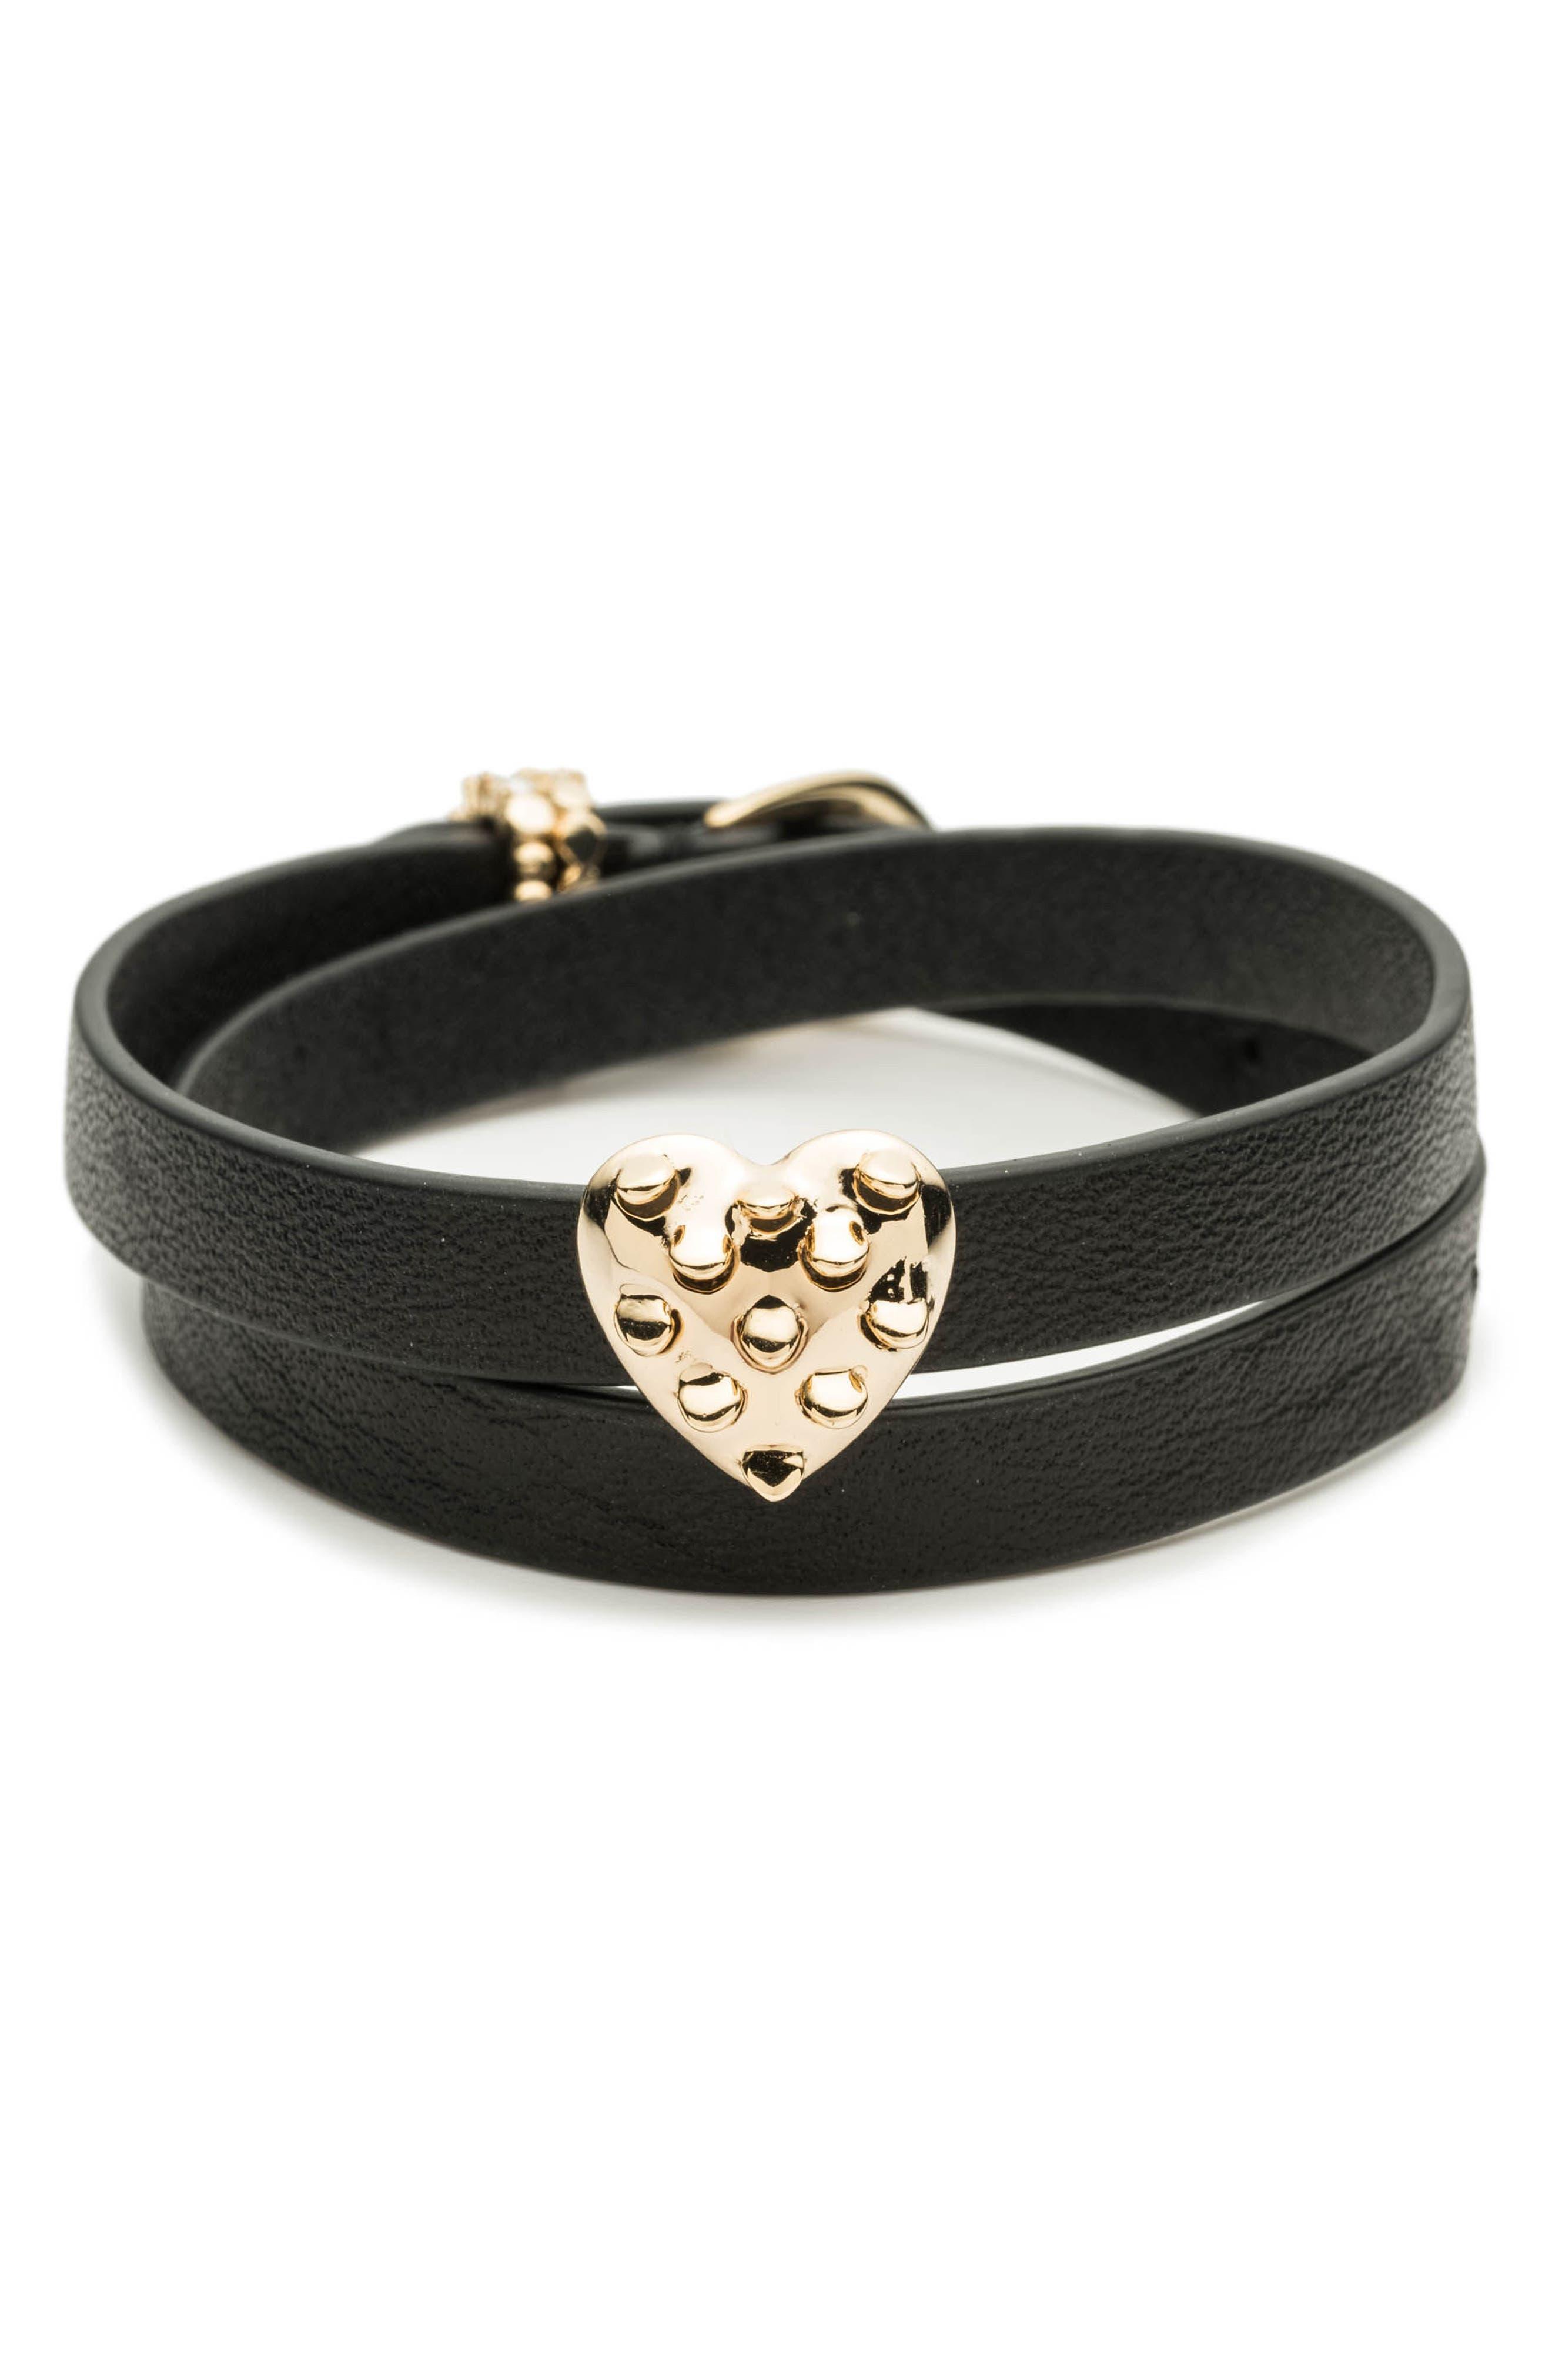 Main Image - Alexis Bittar Grater Heart Slider Leather Wrap Bracelet